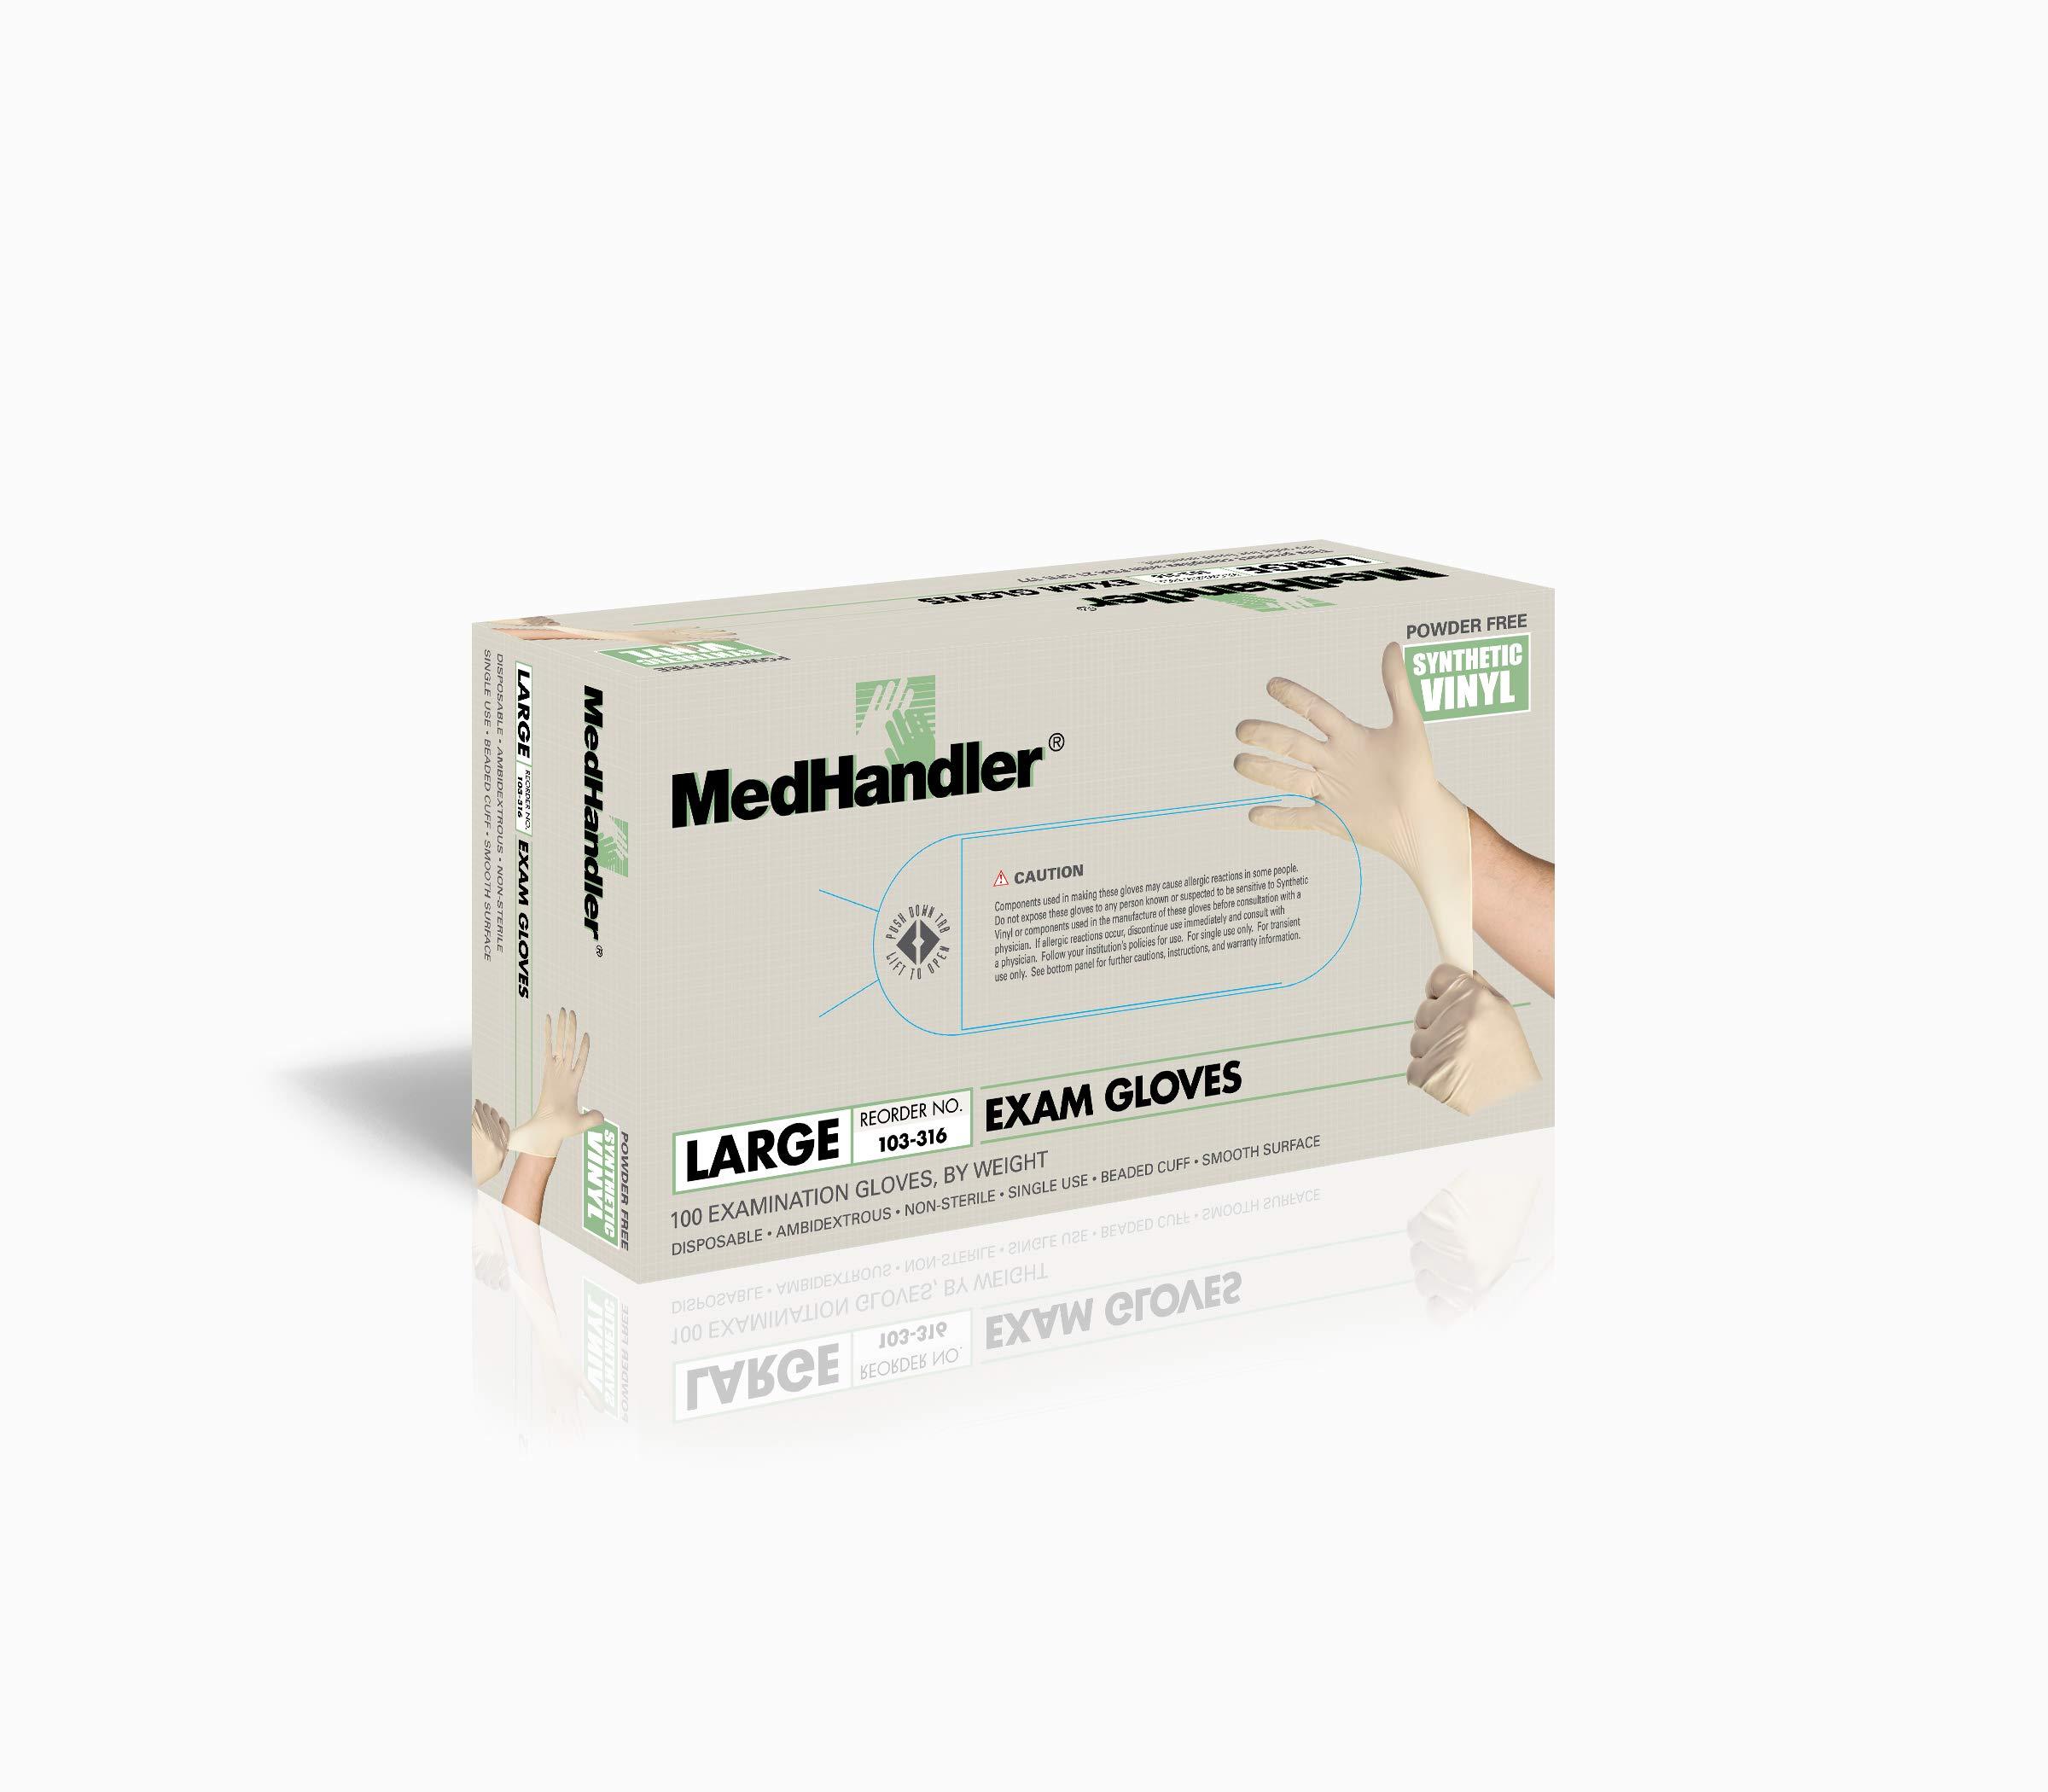 MedHandler 103-316 MedHandler Exam-Grade, Synthetic Vinyl, LG, Natural (Pack of 1000)